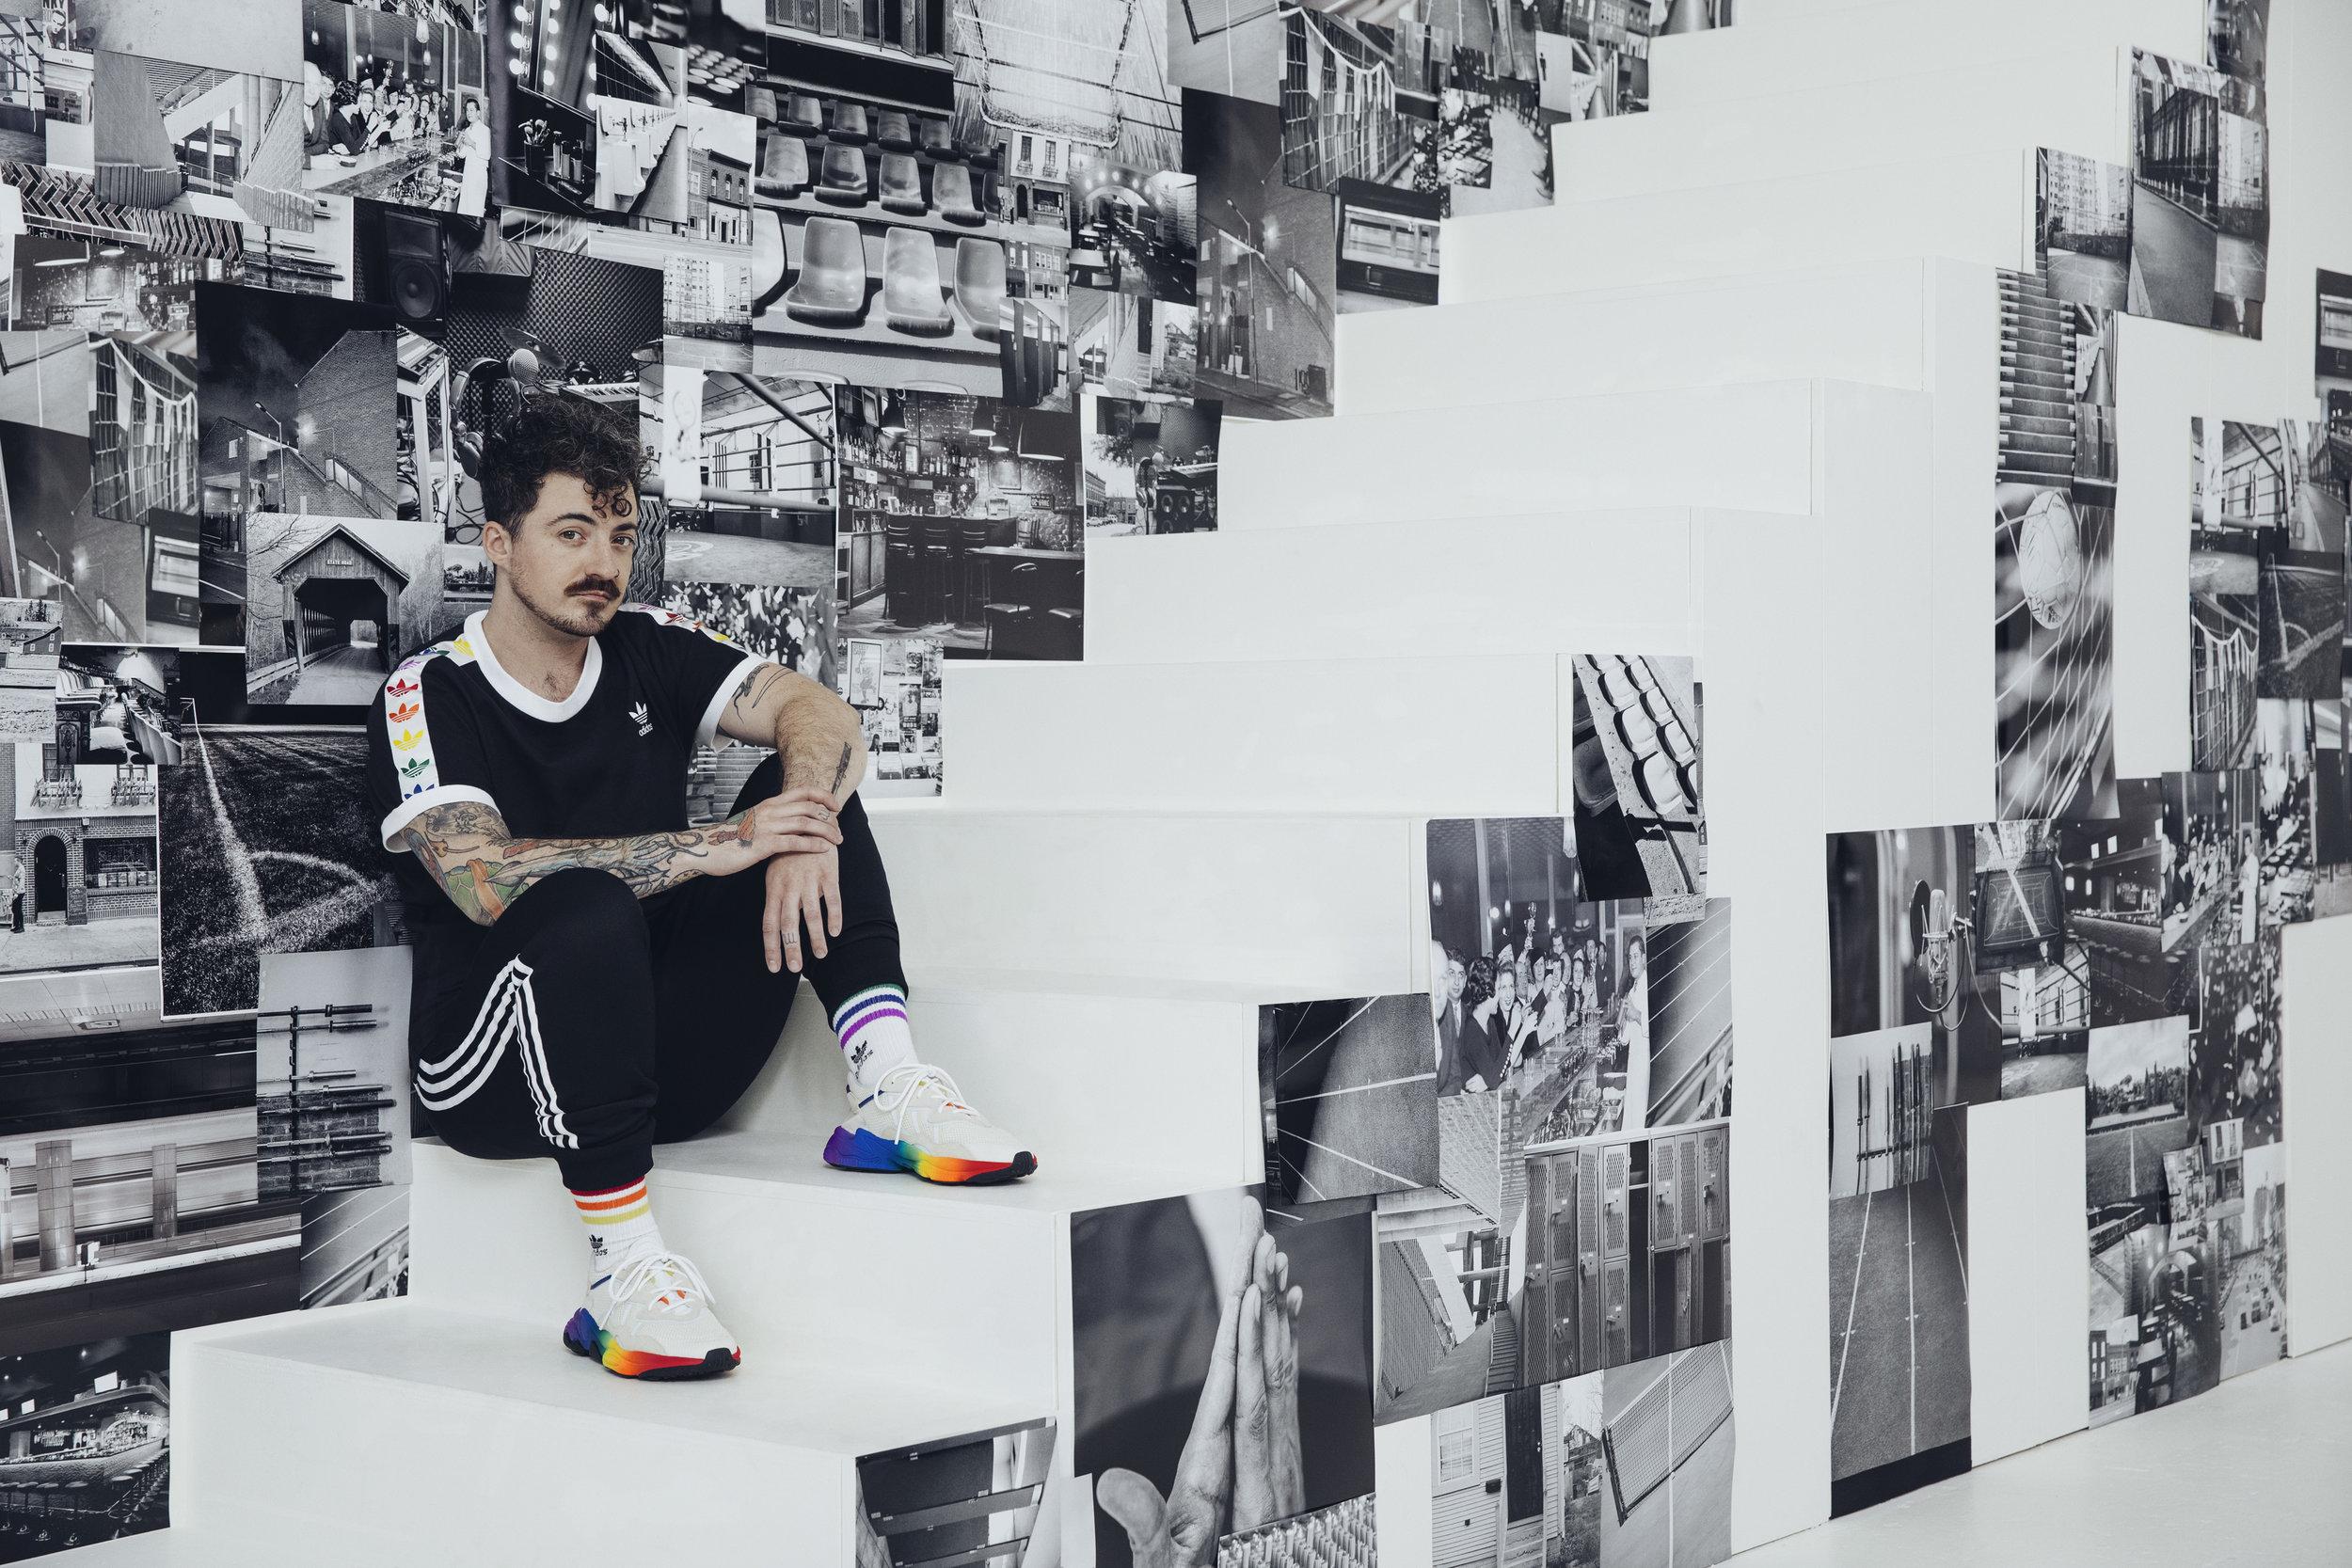 adidas_pride_love_unites_by_gia_goodrich_lesbian_artist_activist_Shot_09_Ace_Lk_02_01027.jpg